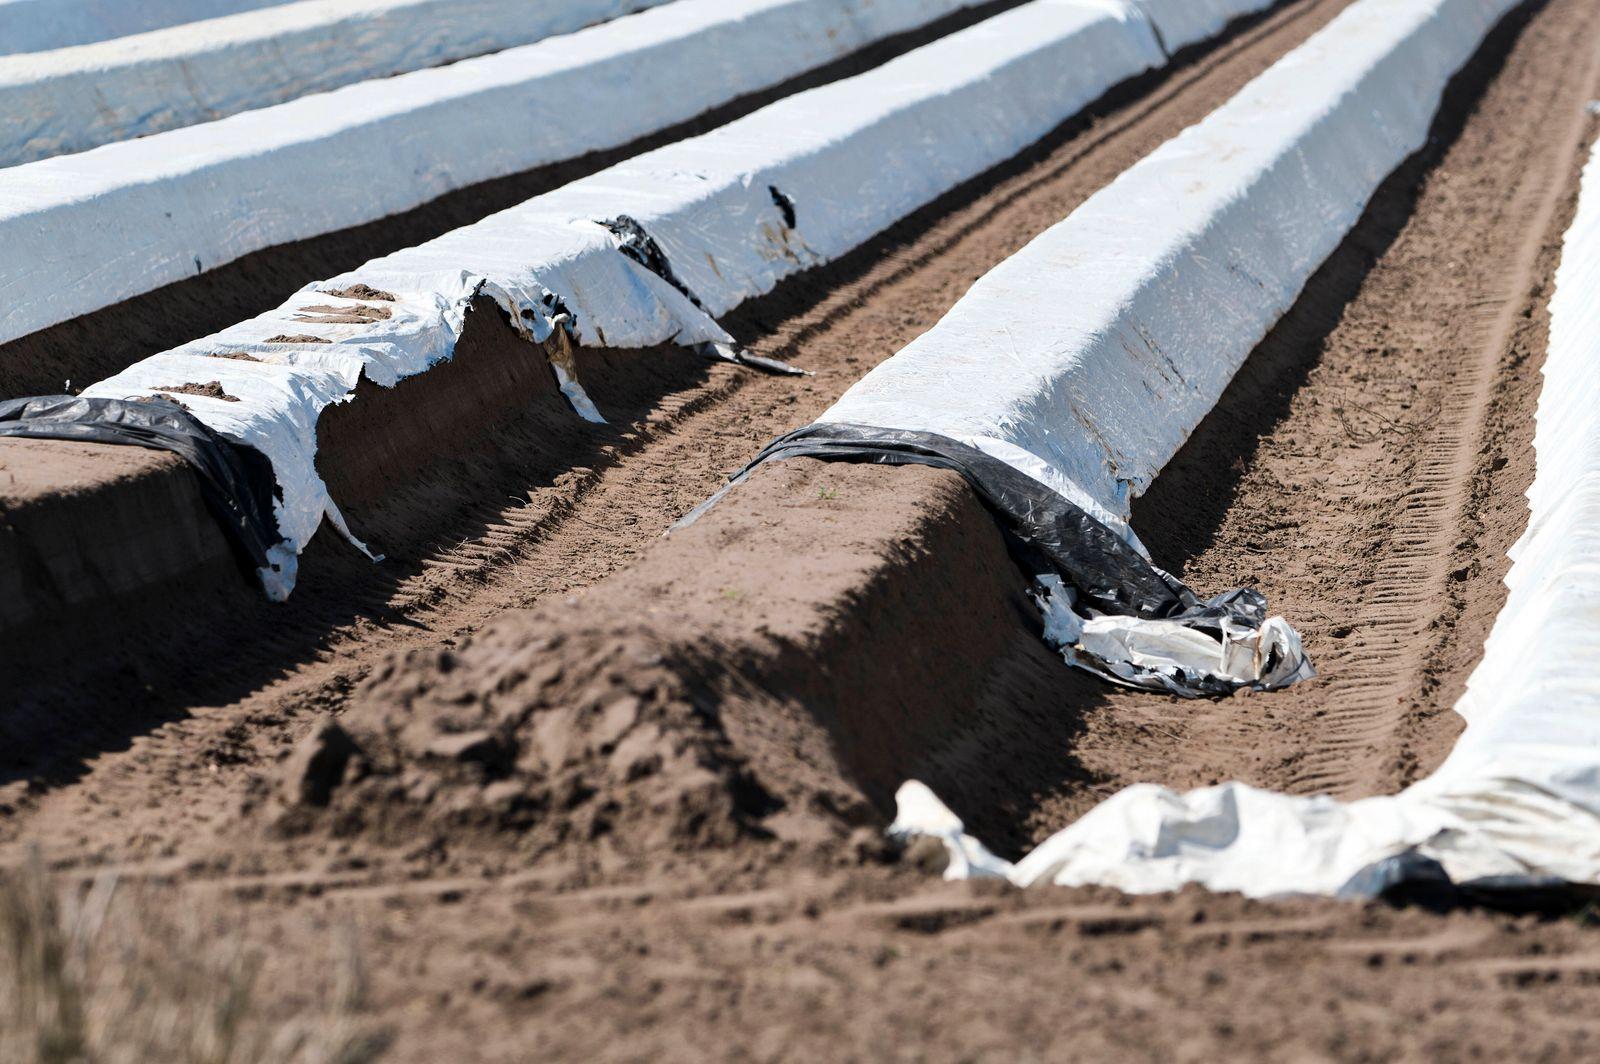 Vorbereitung der Spargelernte. Fuhrberg, 11.04.2020 *** Preparation of the asparagus harvest Fuhrberg, 11 04 2020 Foto: